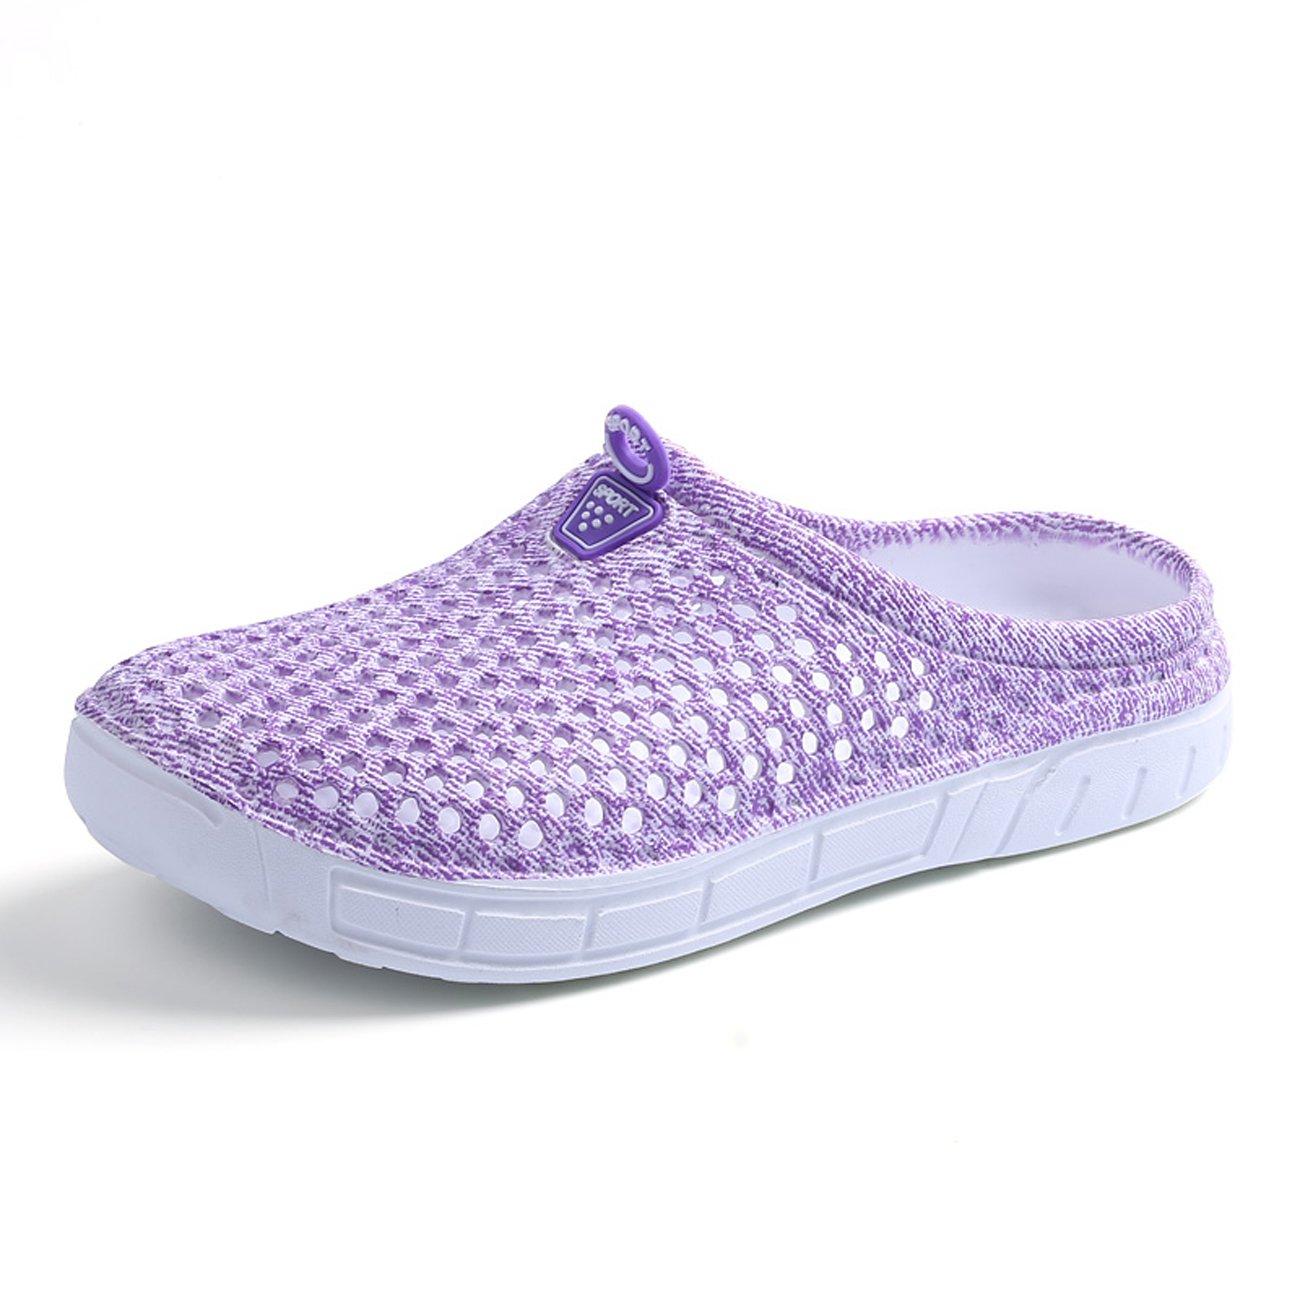 SKYMAIP Women Mesh Summer Garden Clog Breathable Slippers Beach Sandals Shower Footwear Water Shoes Walking Anti-Slip Shoes Purple 41